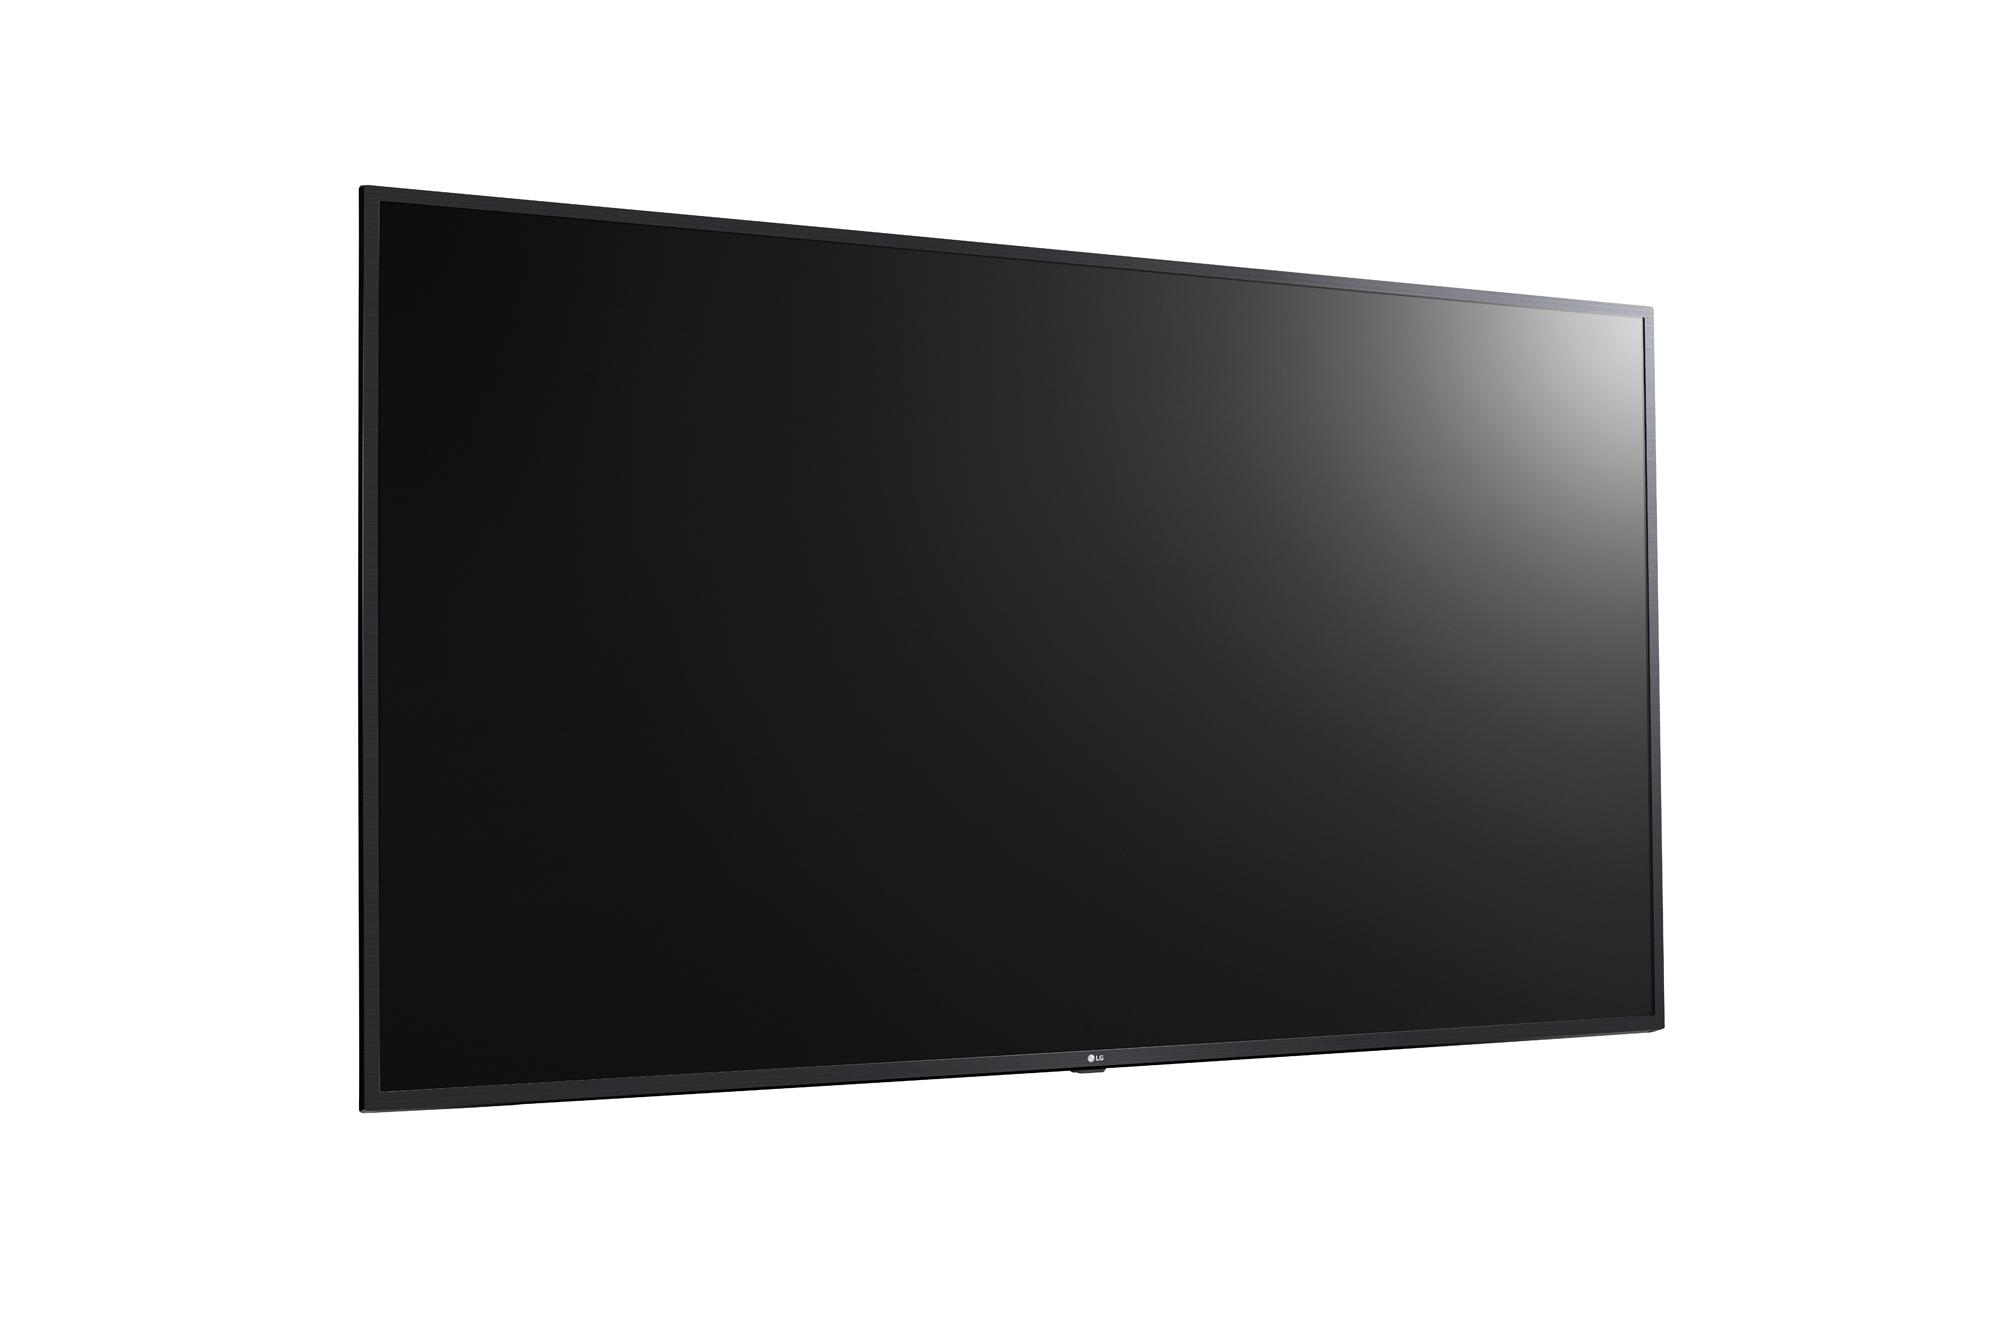 LG Smart TV Signage 70UT640S (CIS) 7